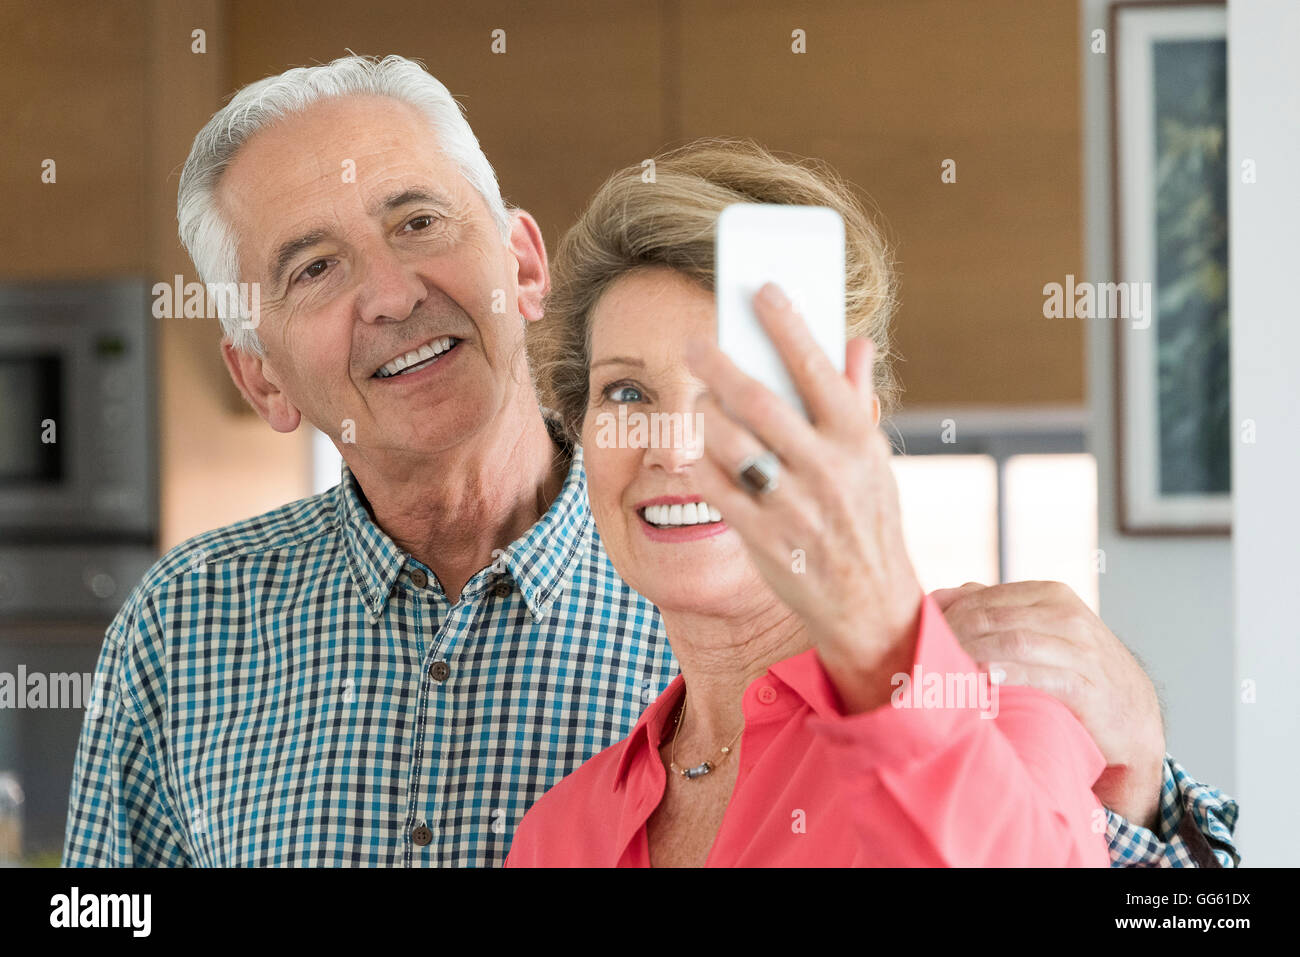 Senior Brautpaar nehmen Selfie mit Kamera-Handy Stockbild